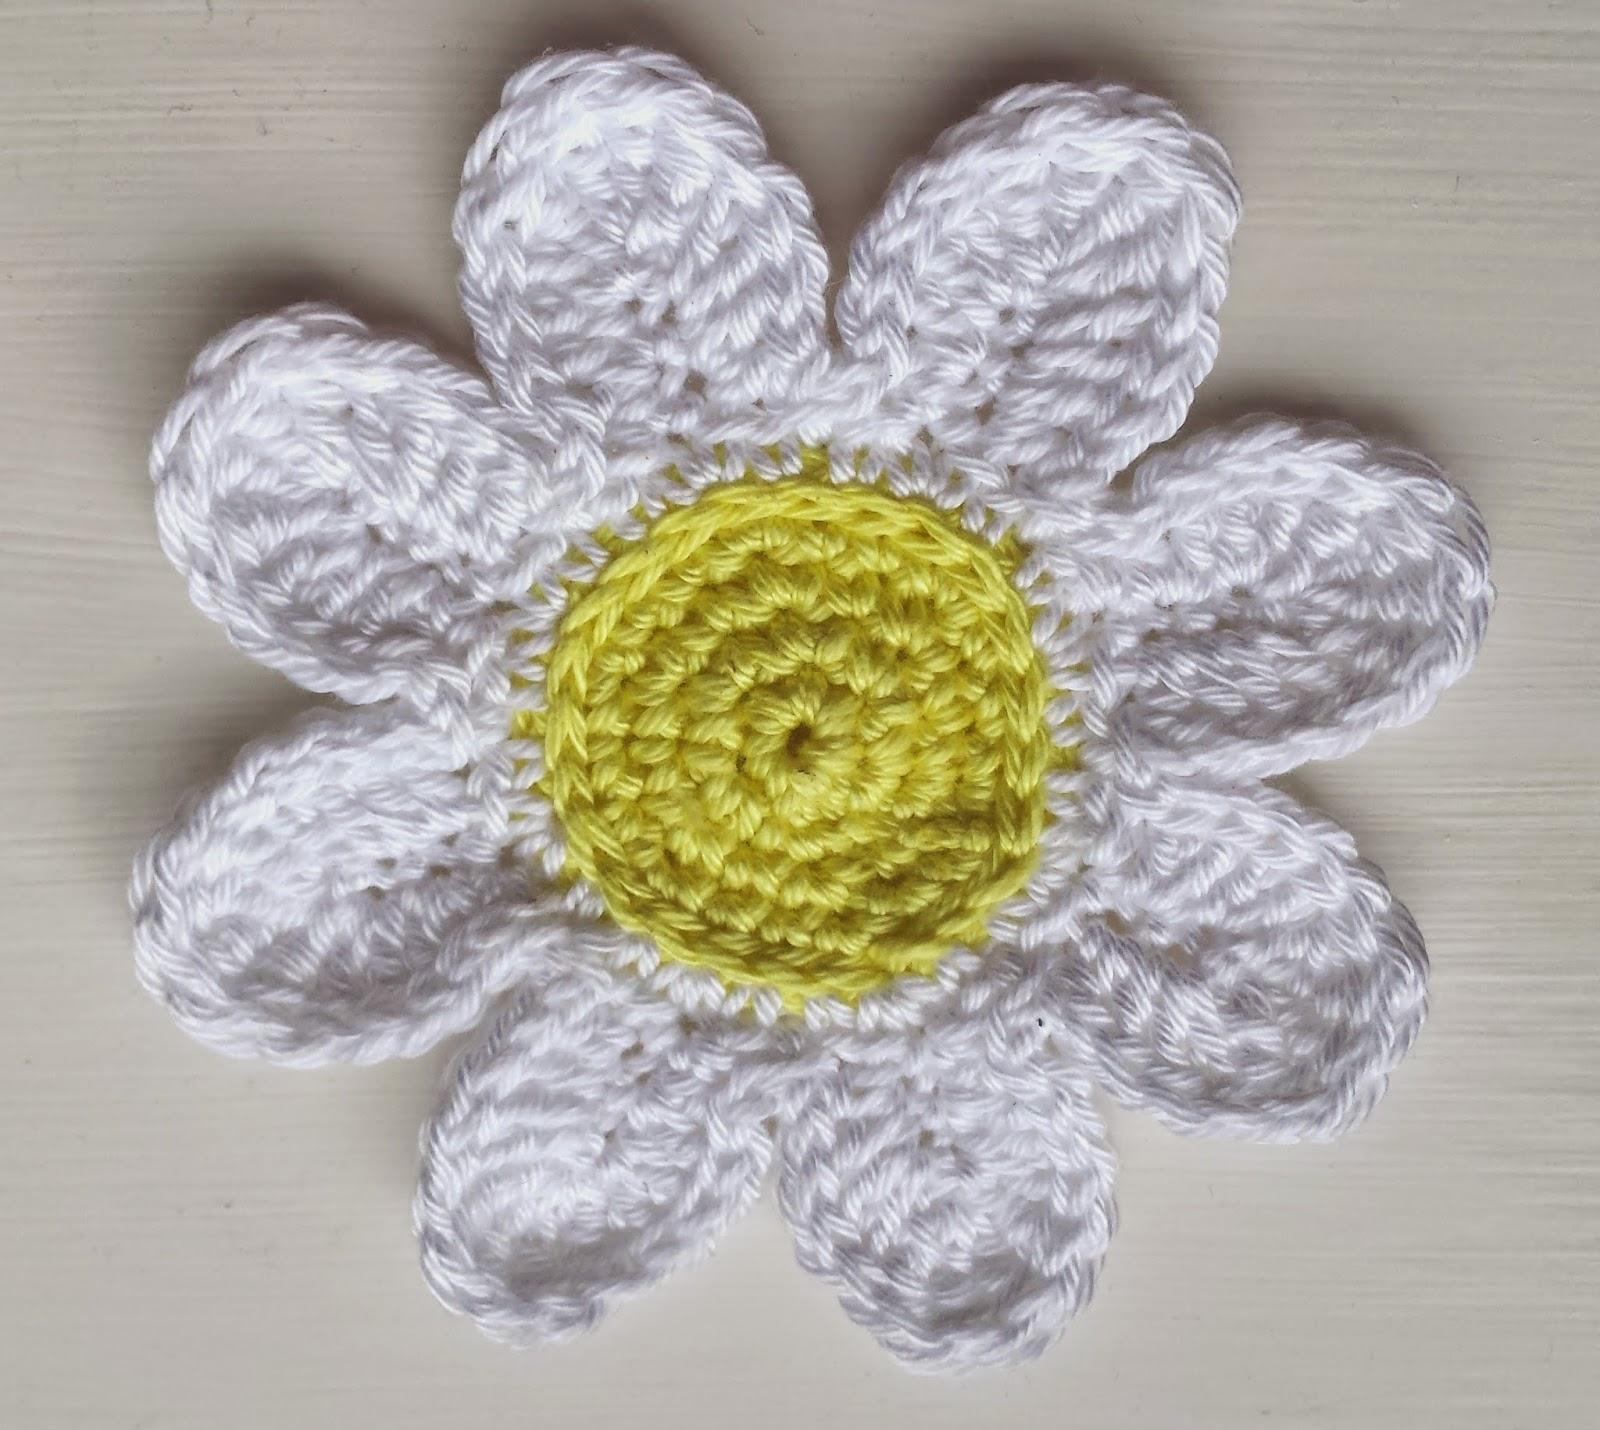 Craigloves2crochet how to crochet a trio of daisies centre of daisy using yellow yarn izmirmasajfo